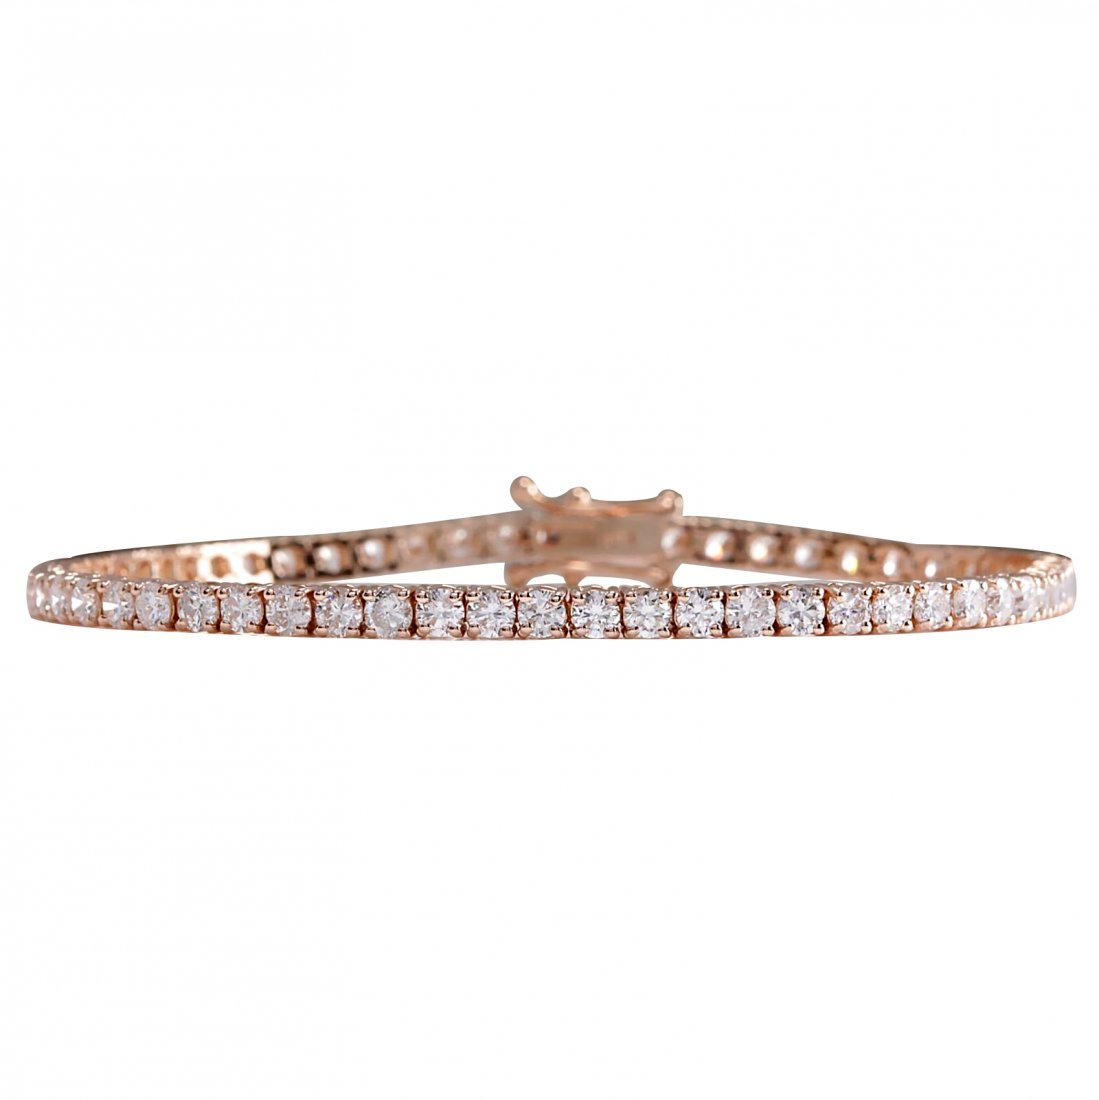 5.55CTW Natural Diamond Bracelet In 14K Rose Gold